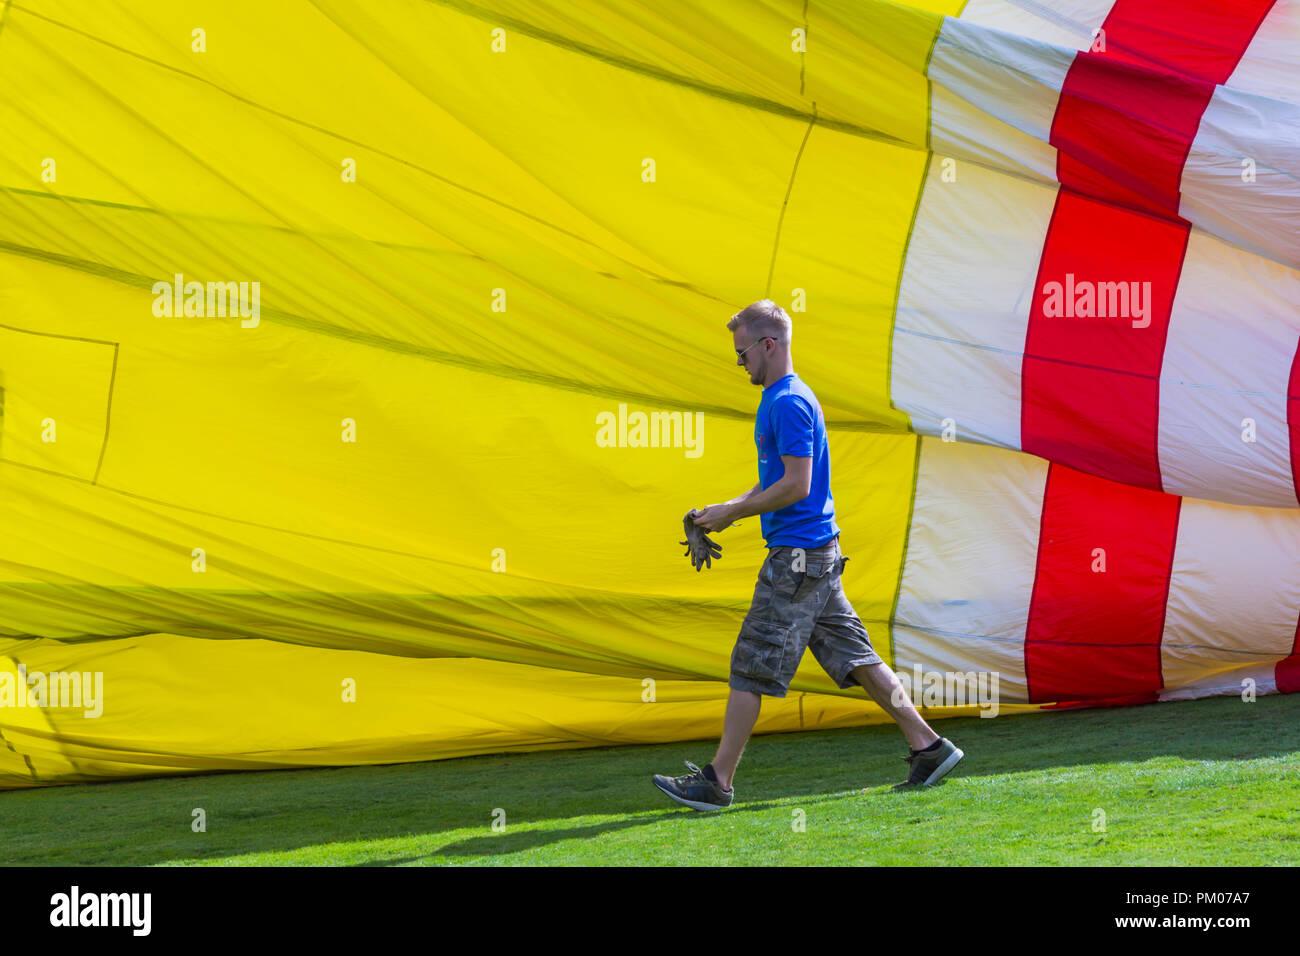 man putting on gloves walking past colourful balloon, preparing hot air balloon at Longleat Sky Safari, Wiltshire, UK in September - Stock Image